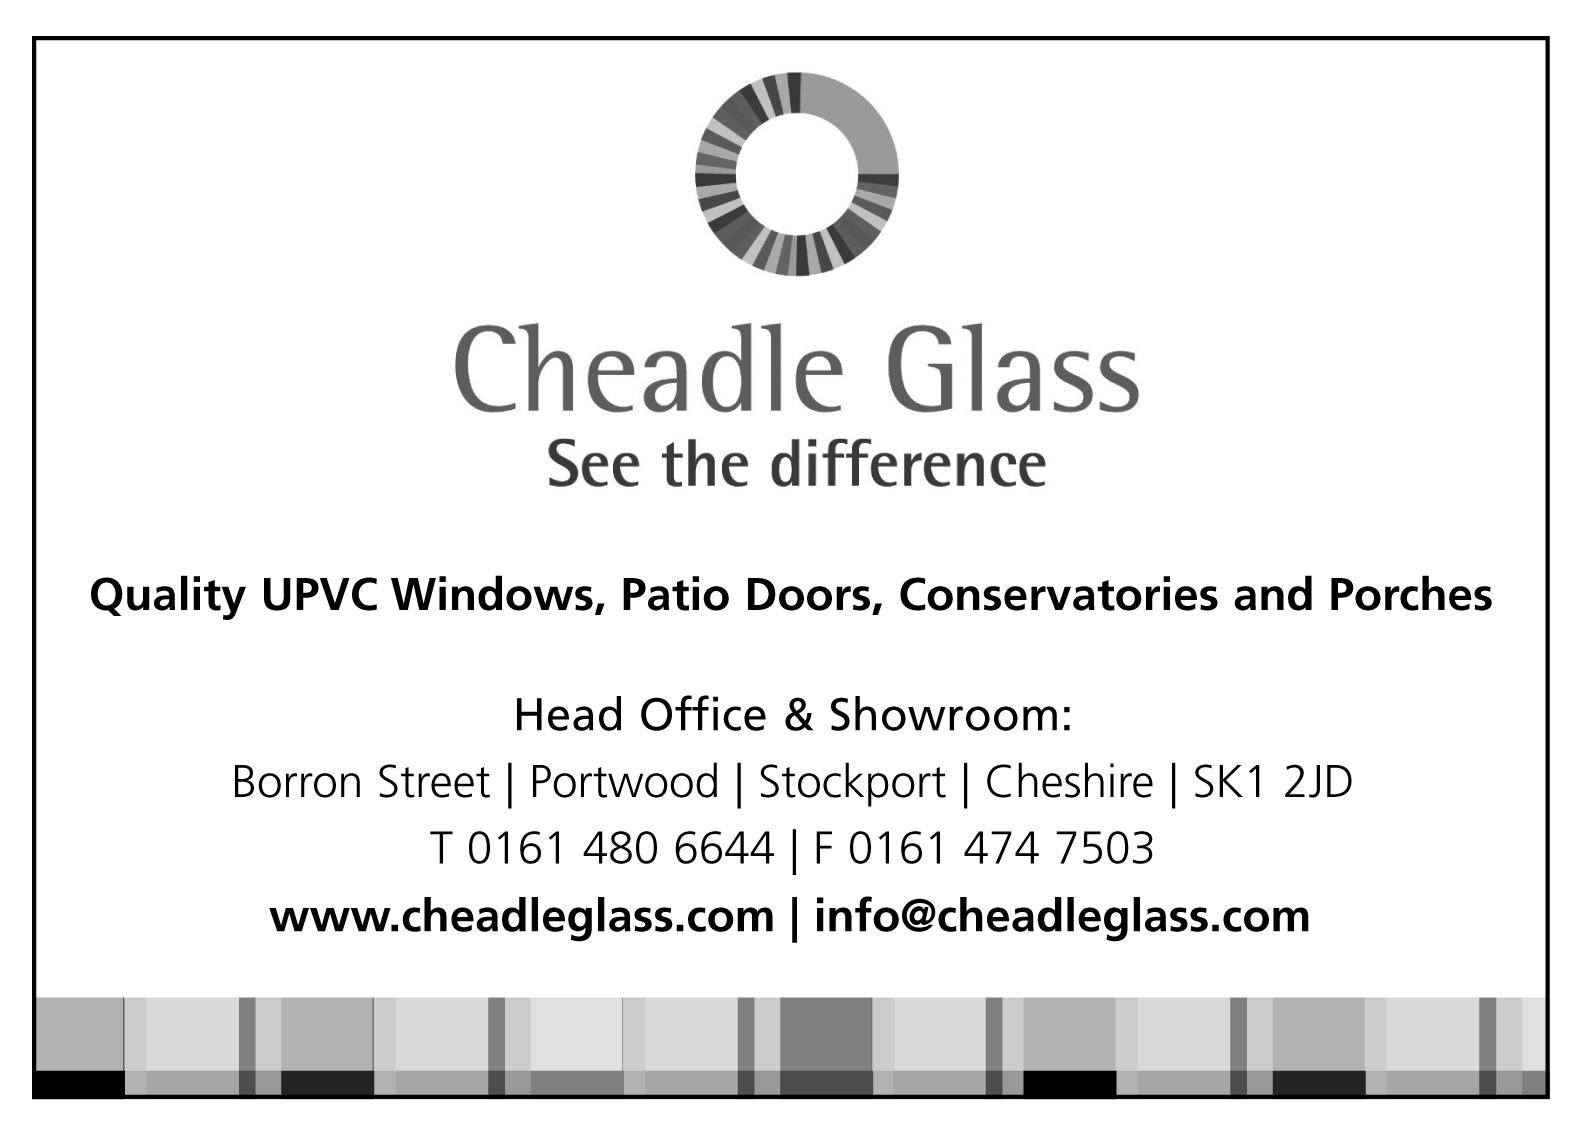 CheadleGlass2018